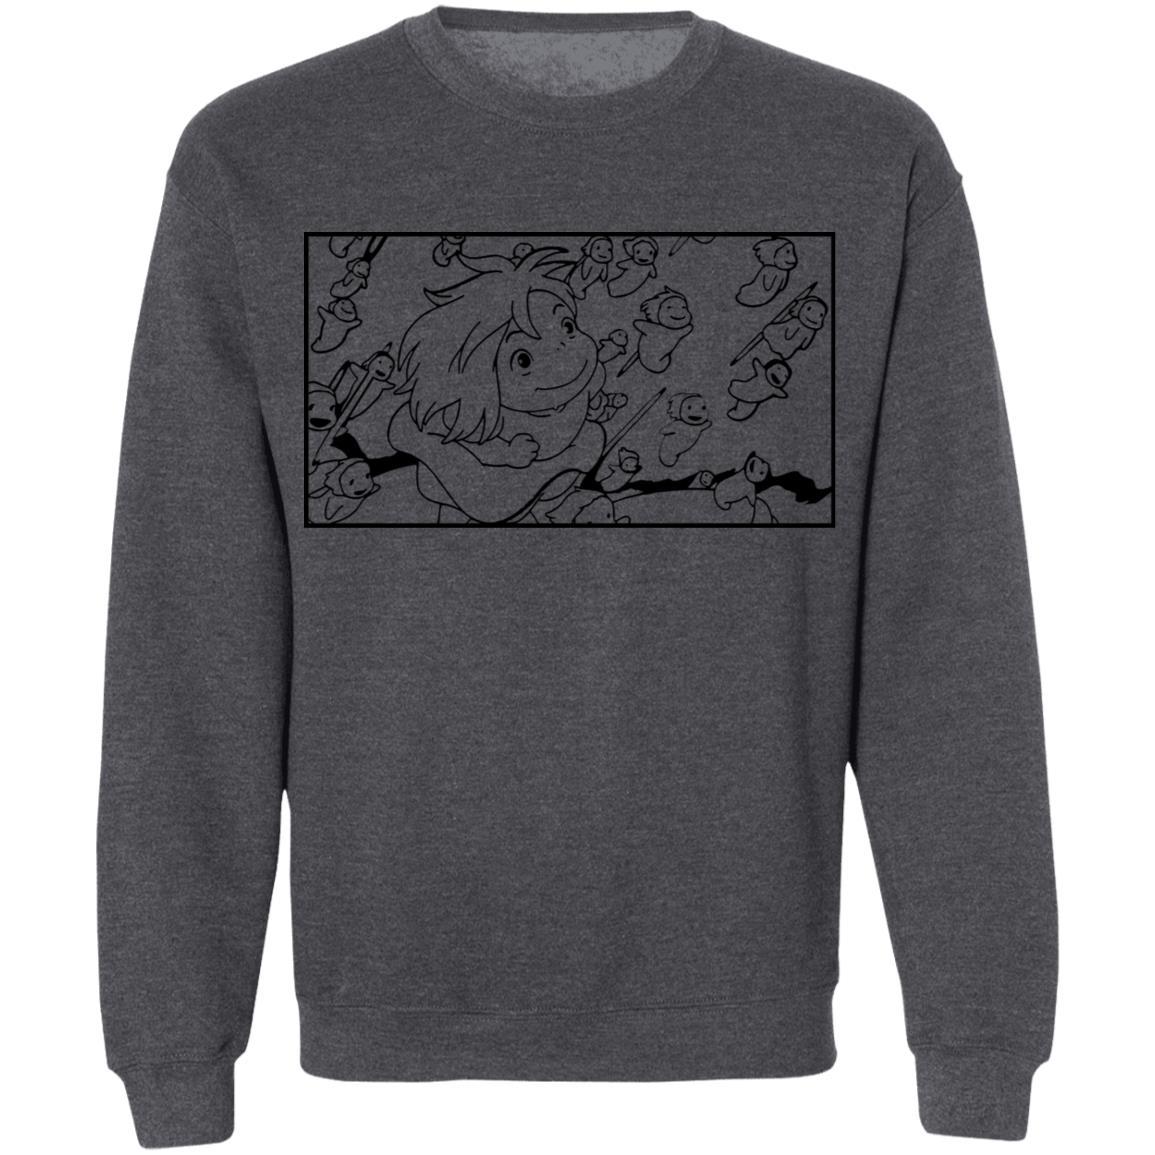 Ponyo – Freedom Sketch Sweatshirt